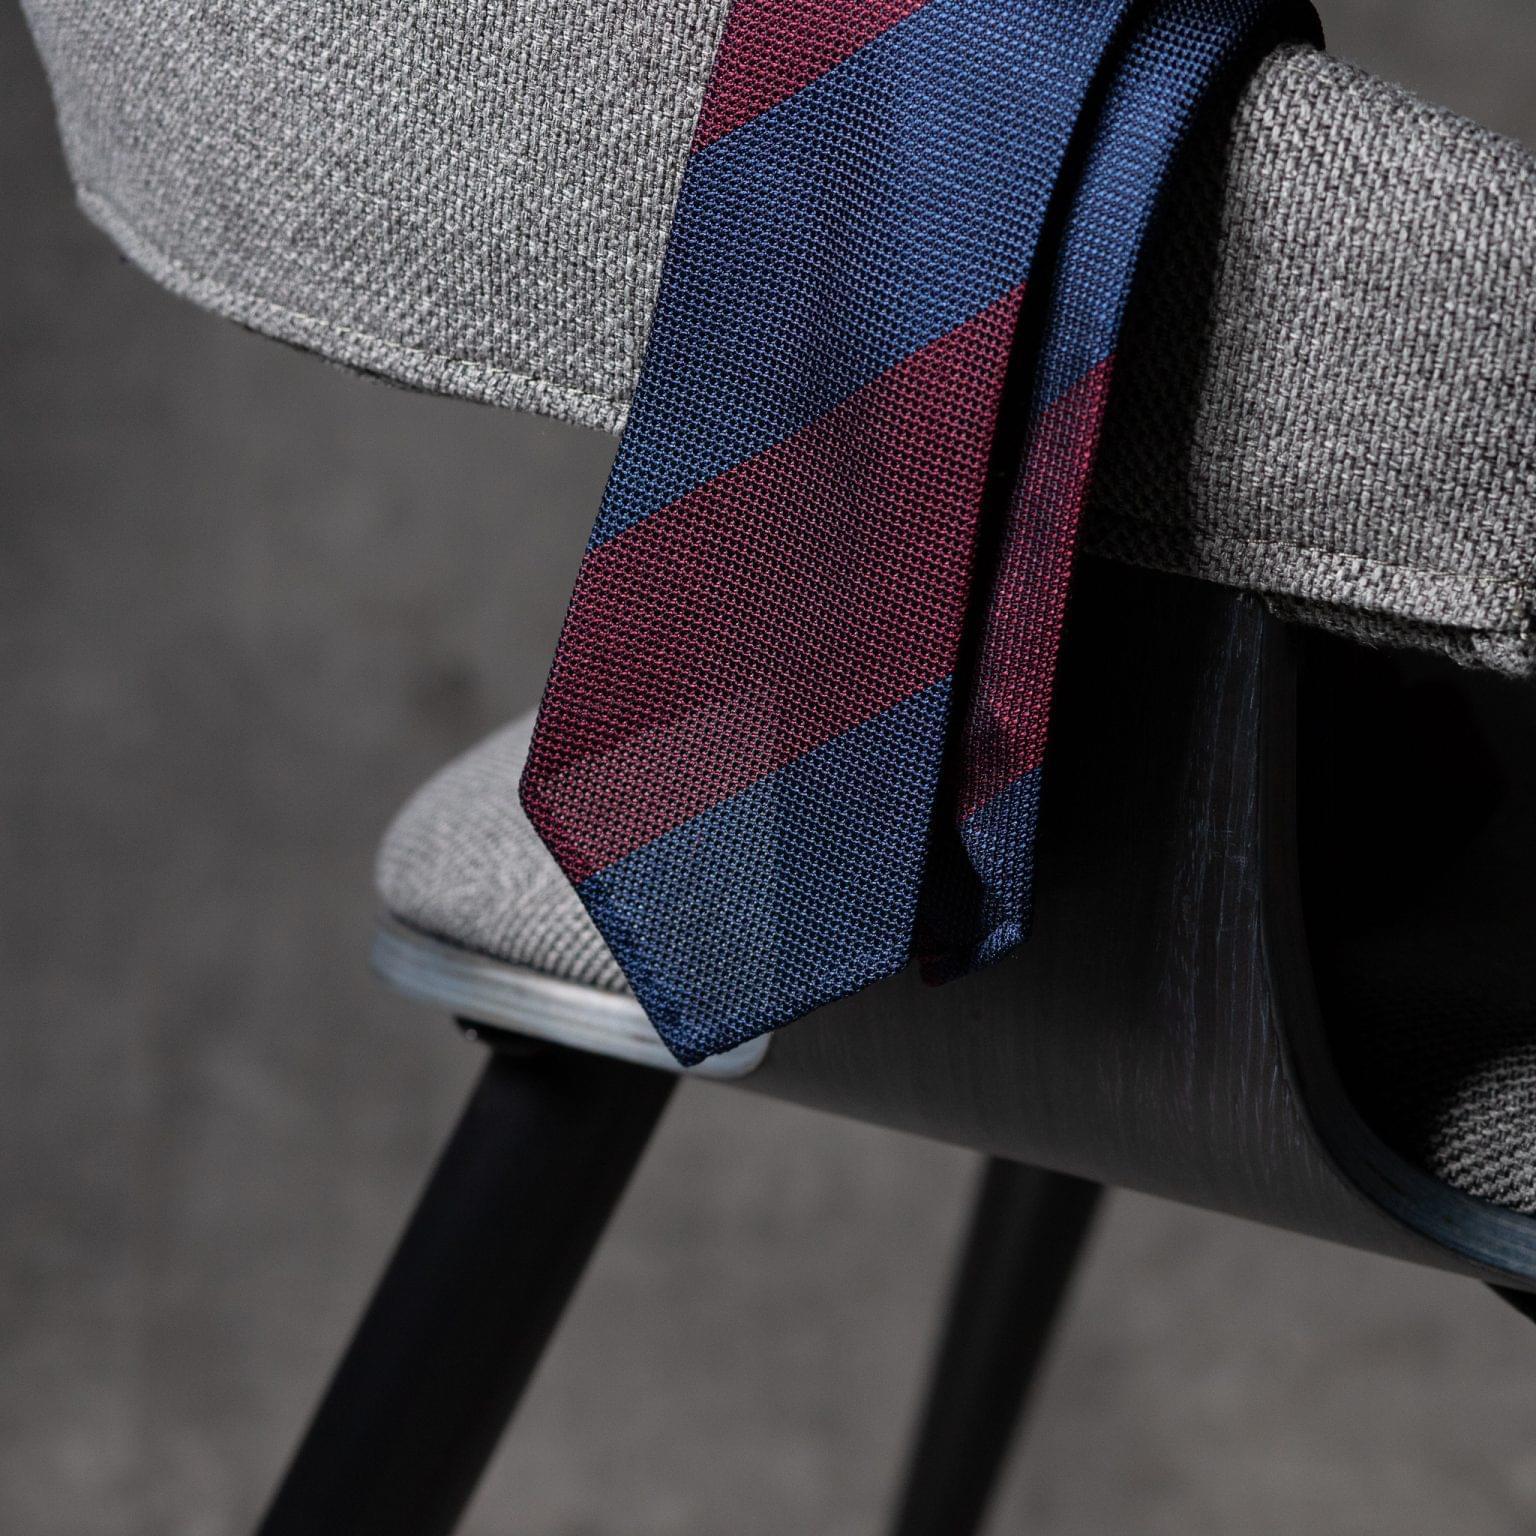 GRENADINE-0357-Tie-Initials-Corbata-Iniciales-The-Seelk-2